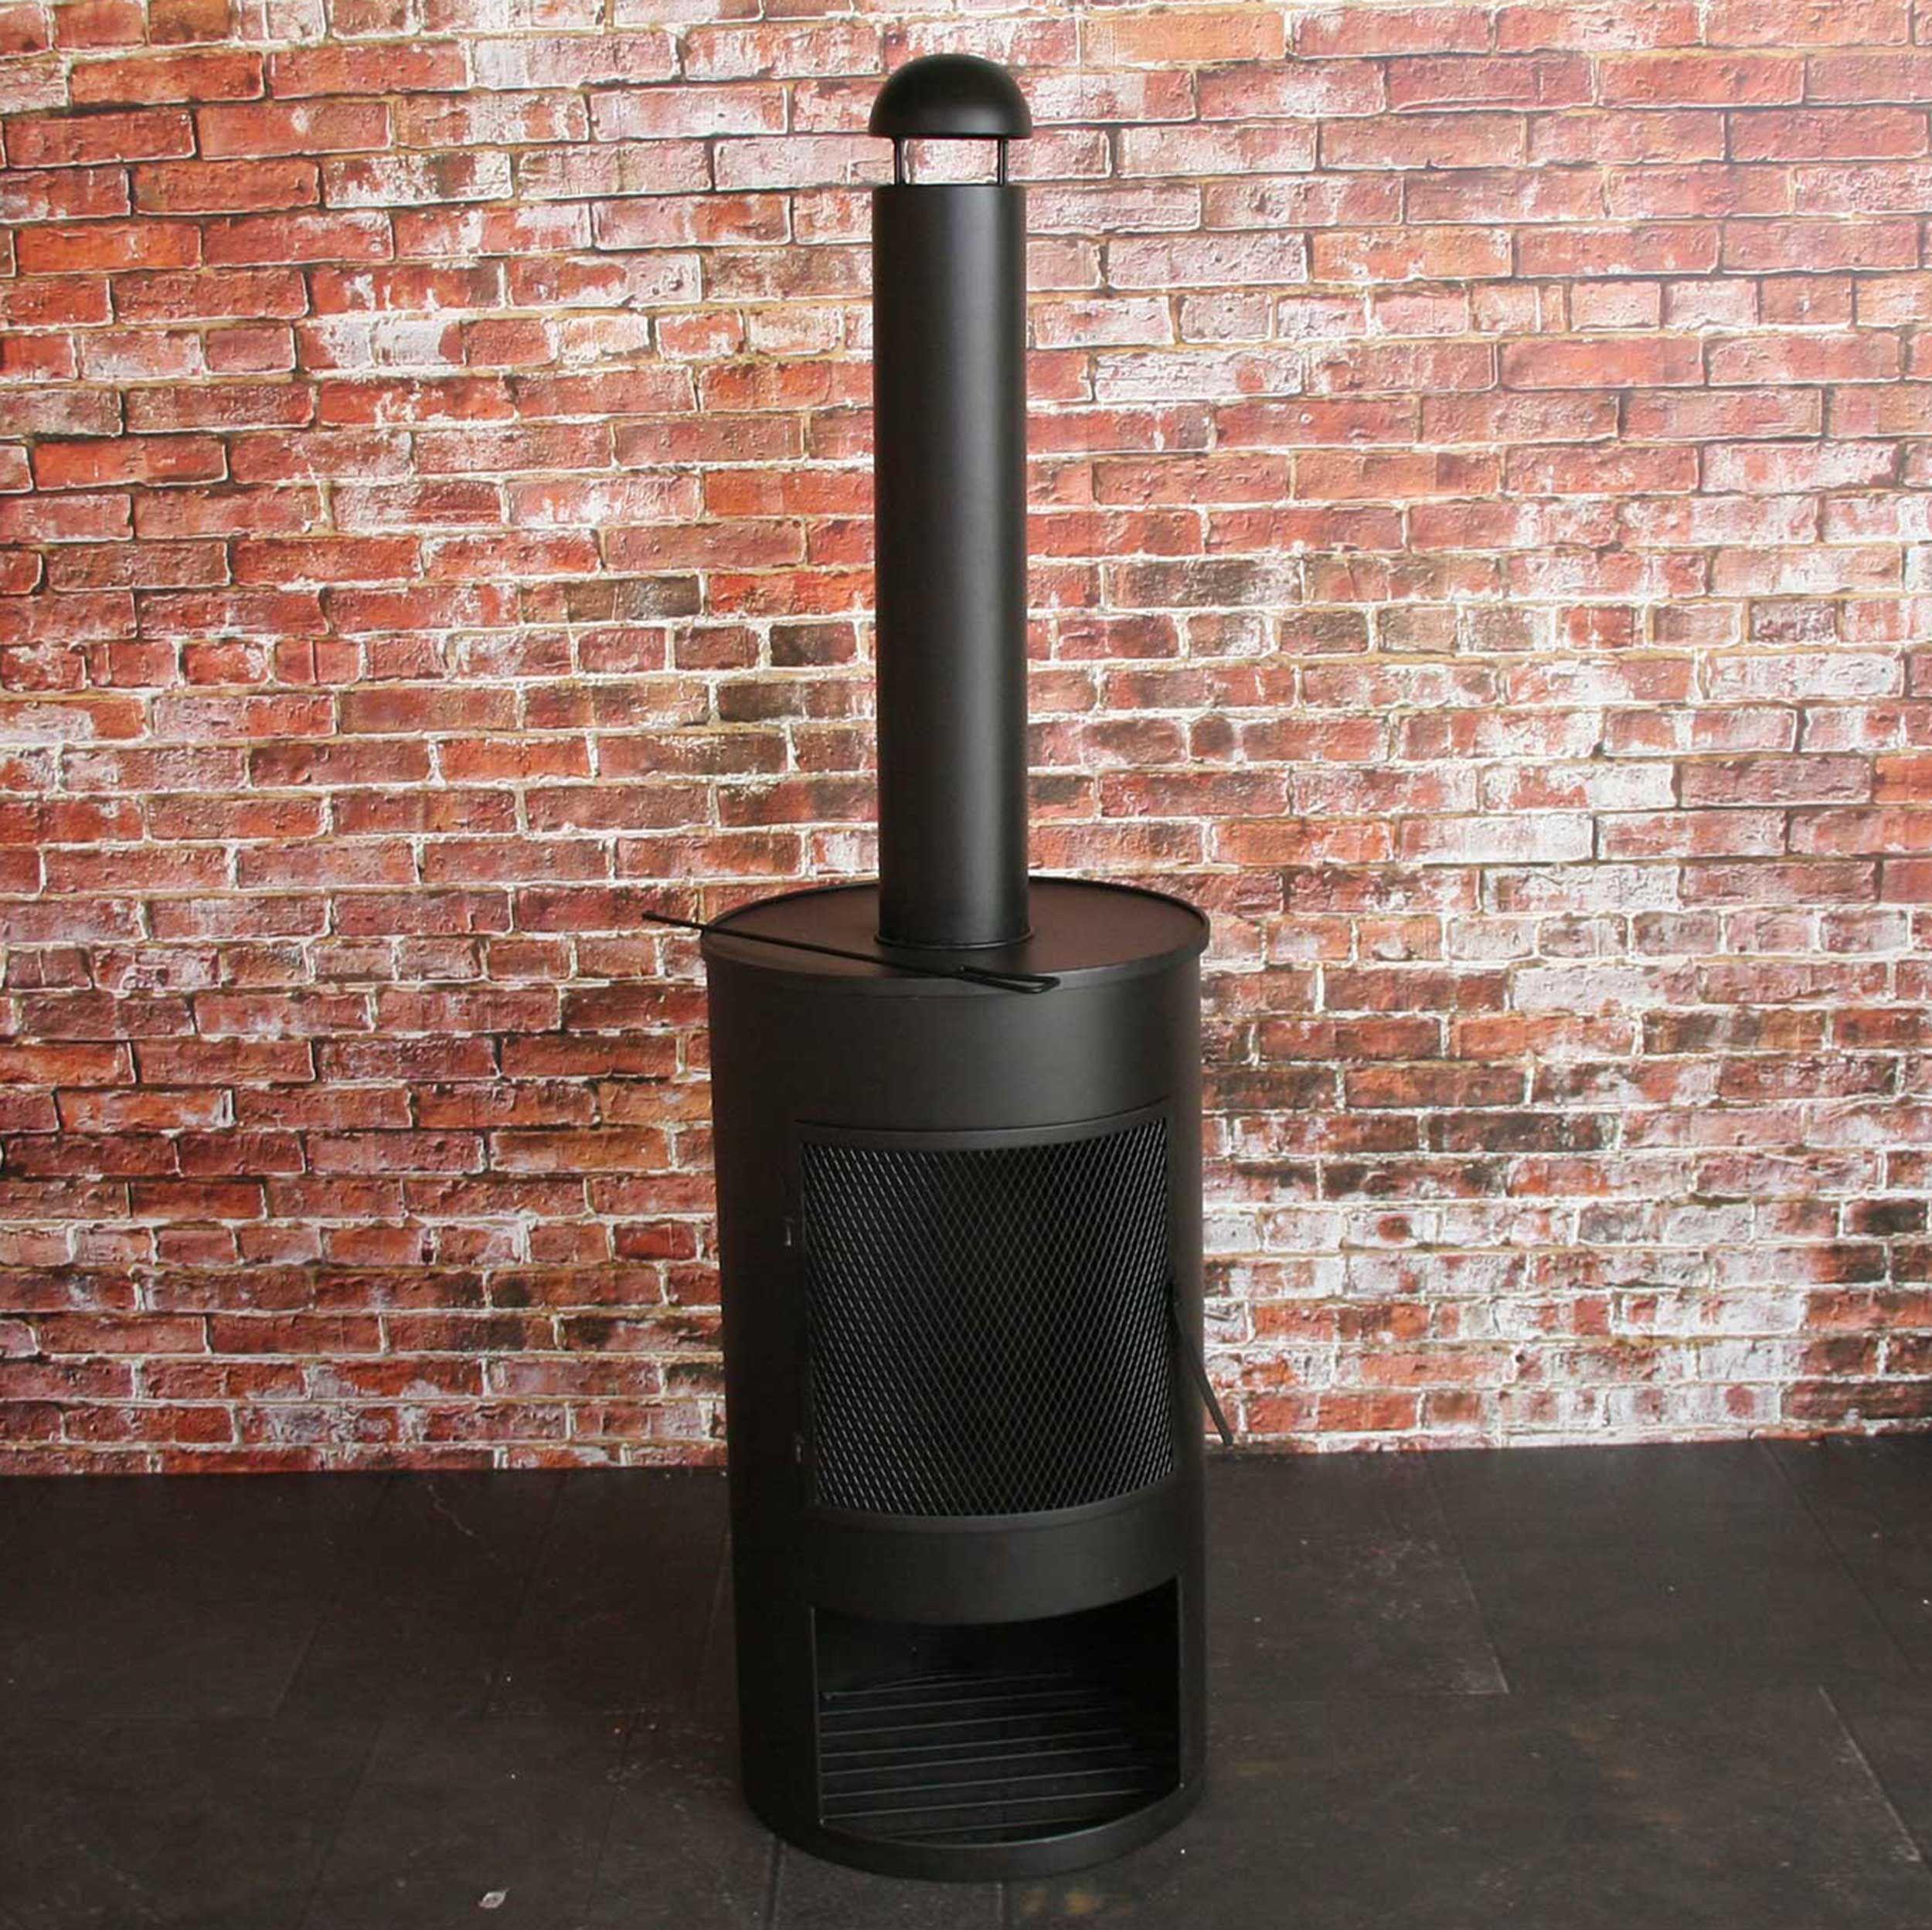 SenS-Line Drumpot Terrassenofen